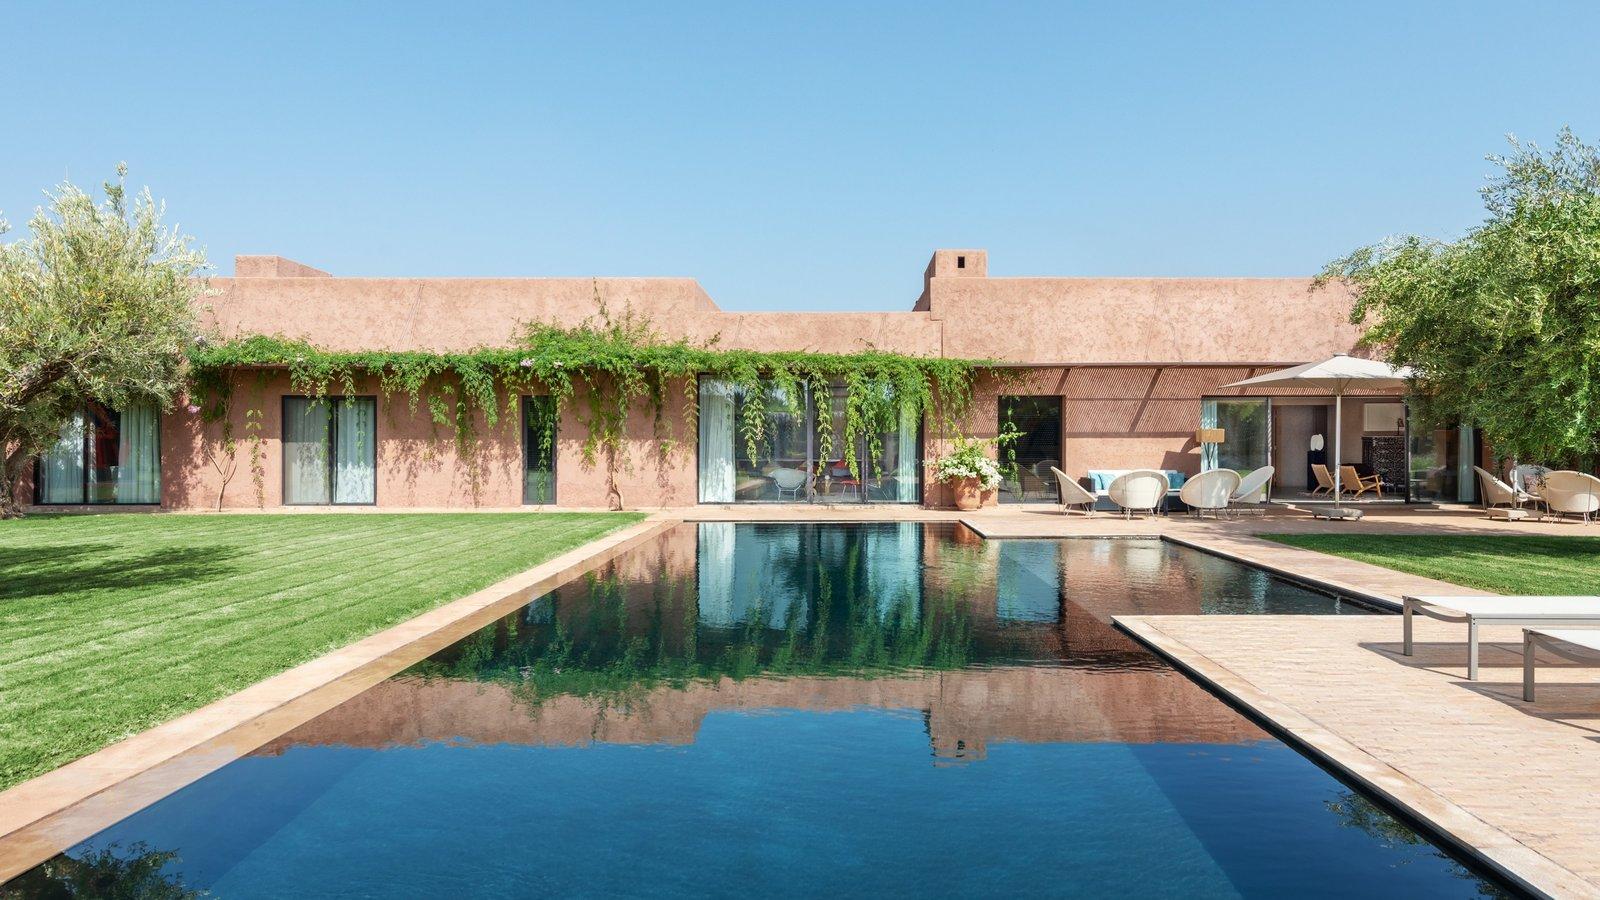 Airbnb Luxe Villa Agar in Marrakesh, Morocco